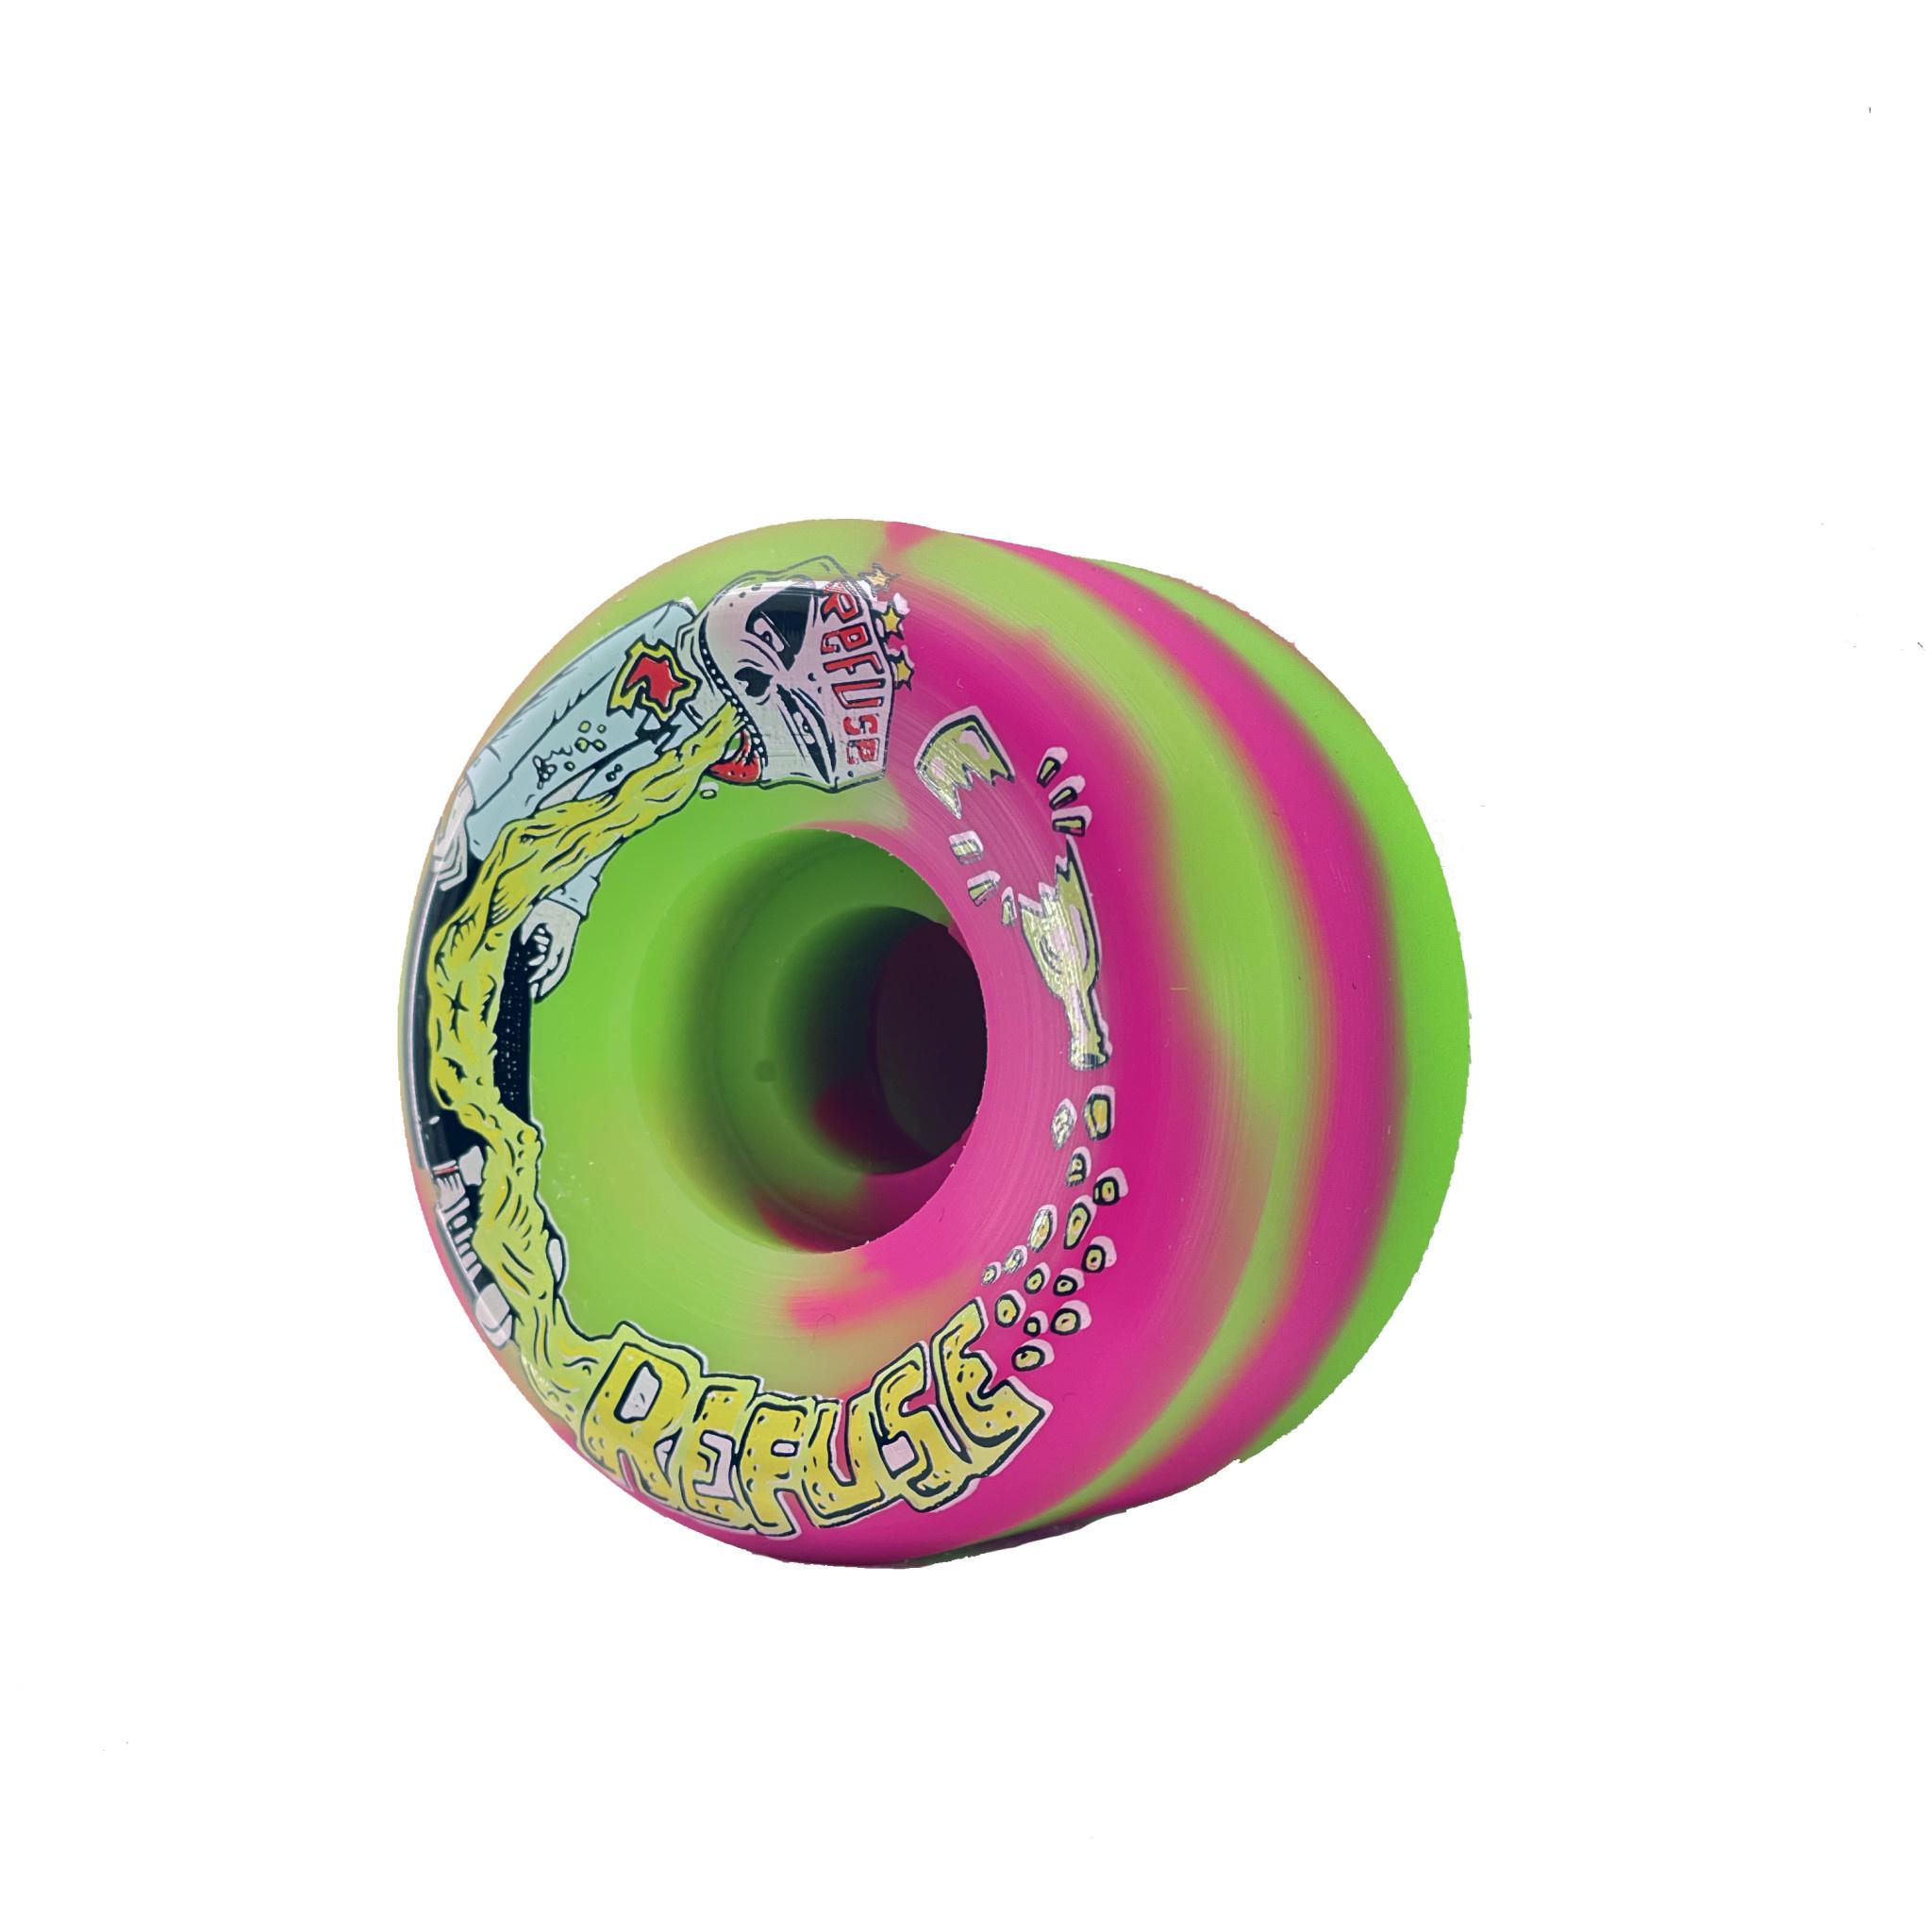 Refuse Wheels Refuse - Pink Green Swirl  101a